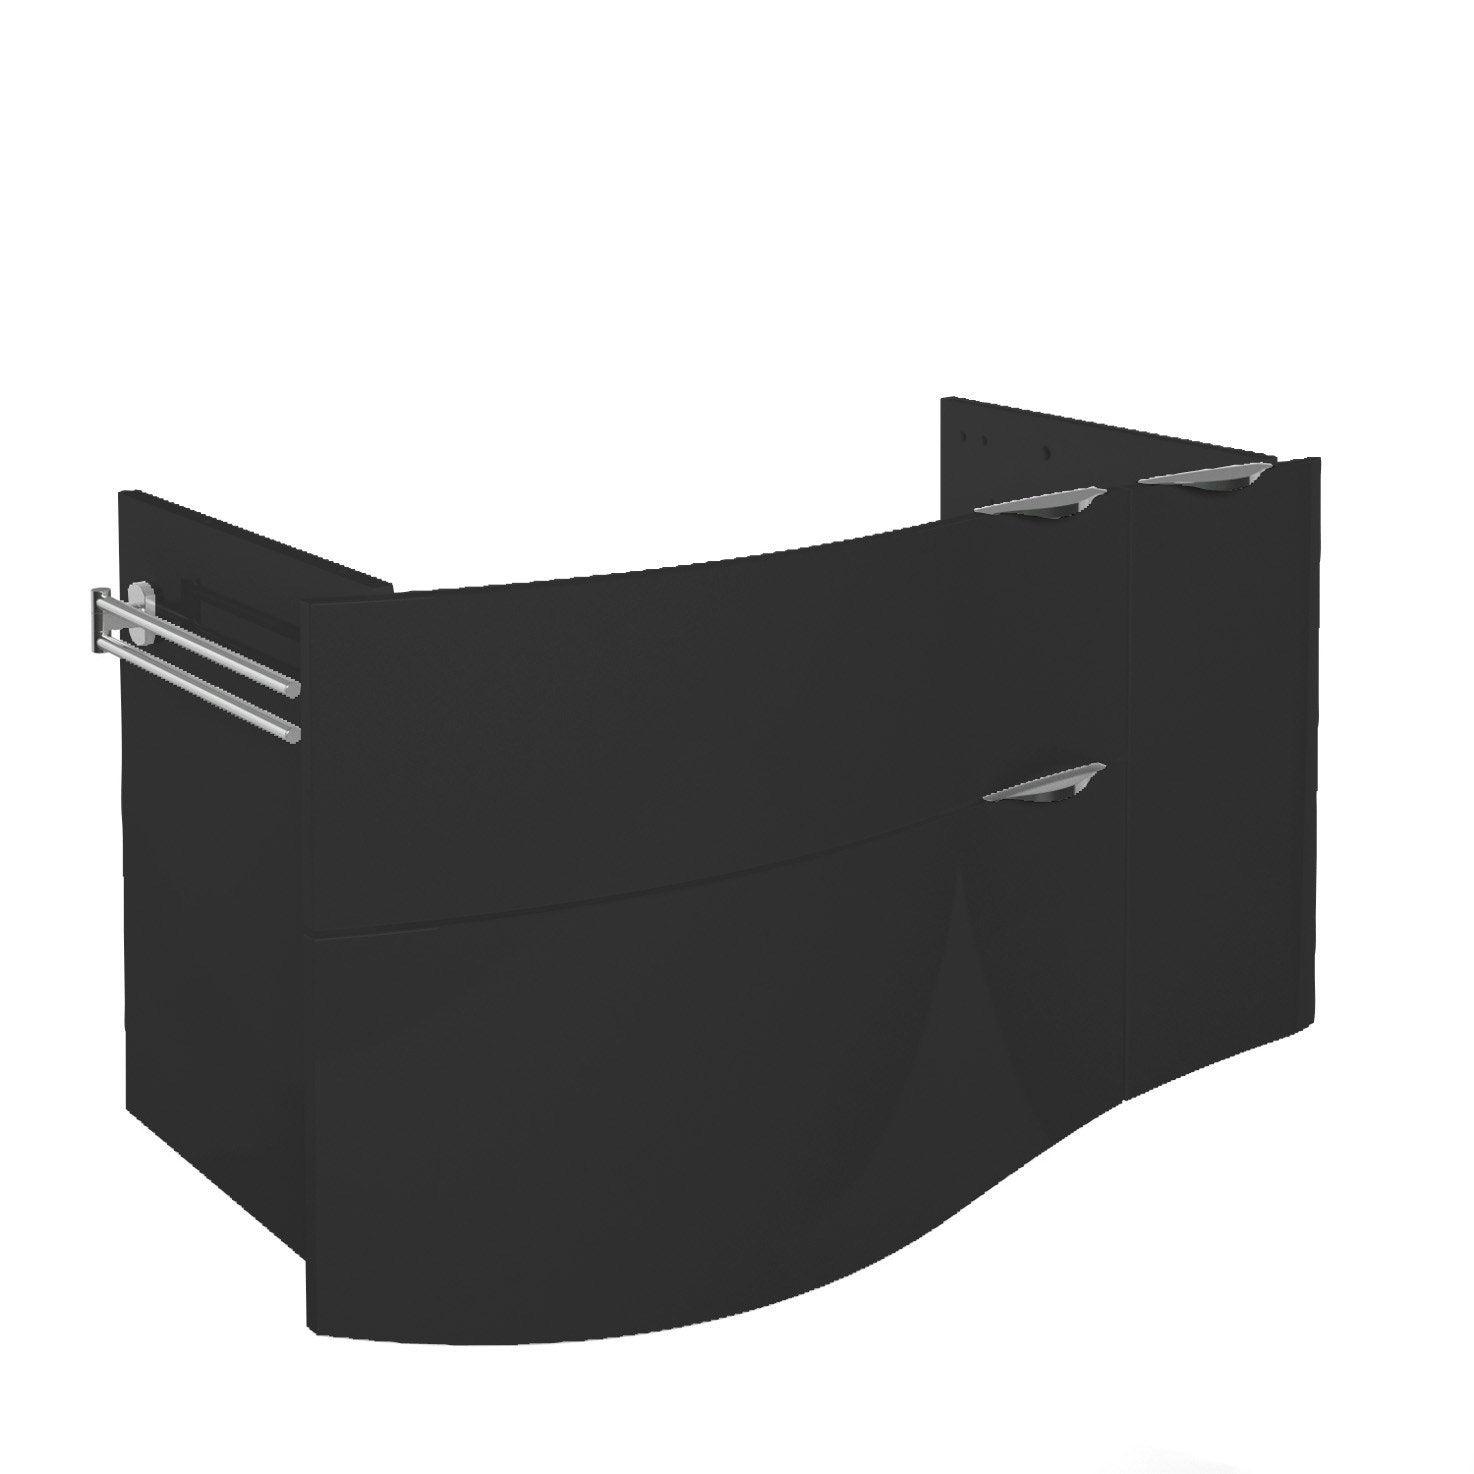 Meuble sous vasque x x cm noir for Meuble double vasque 100 cm leroy merlin